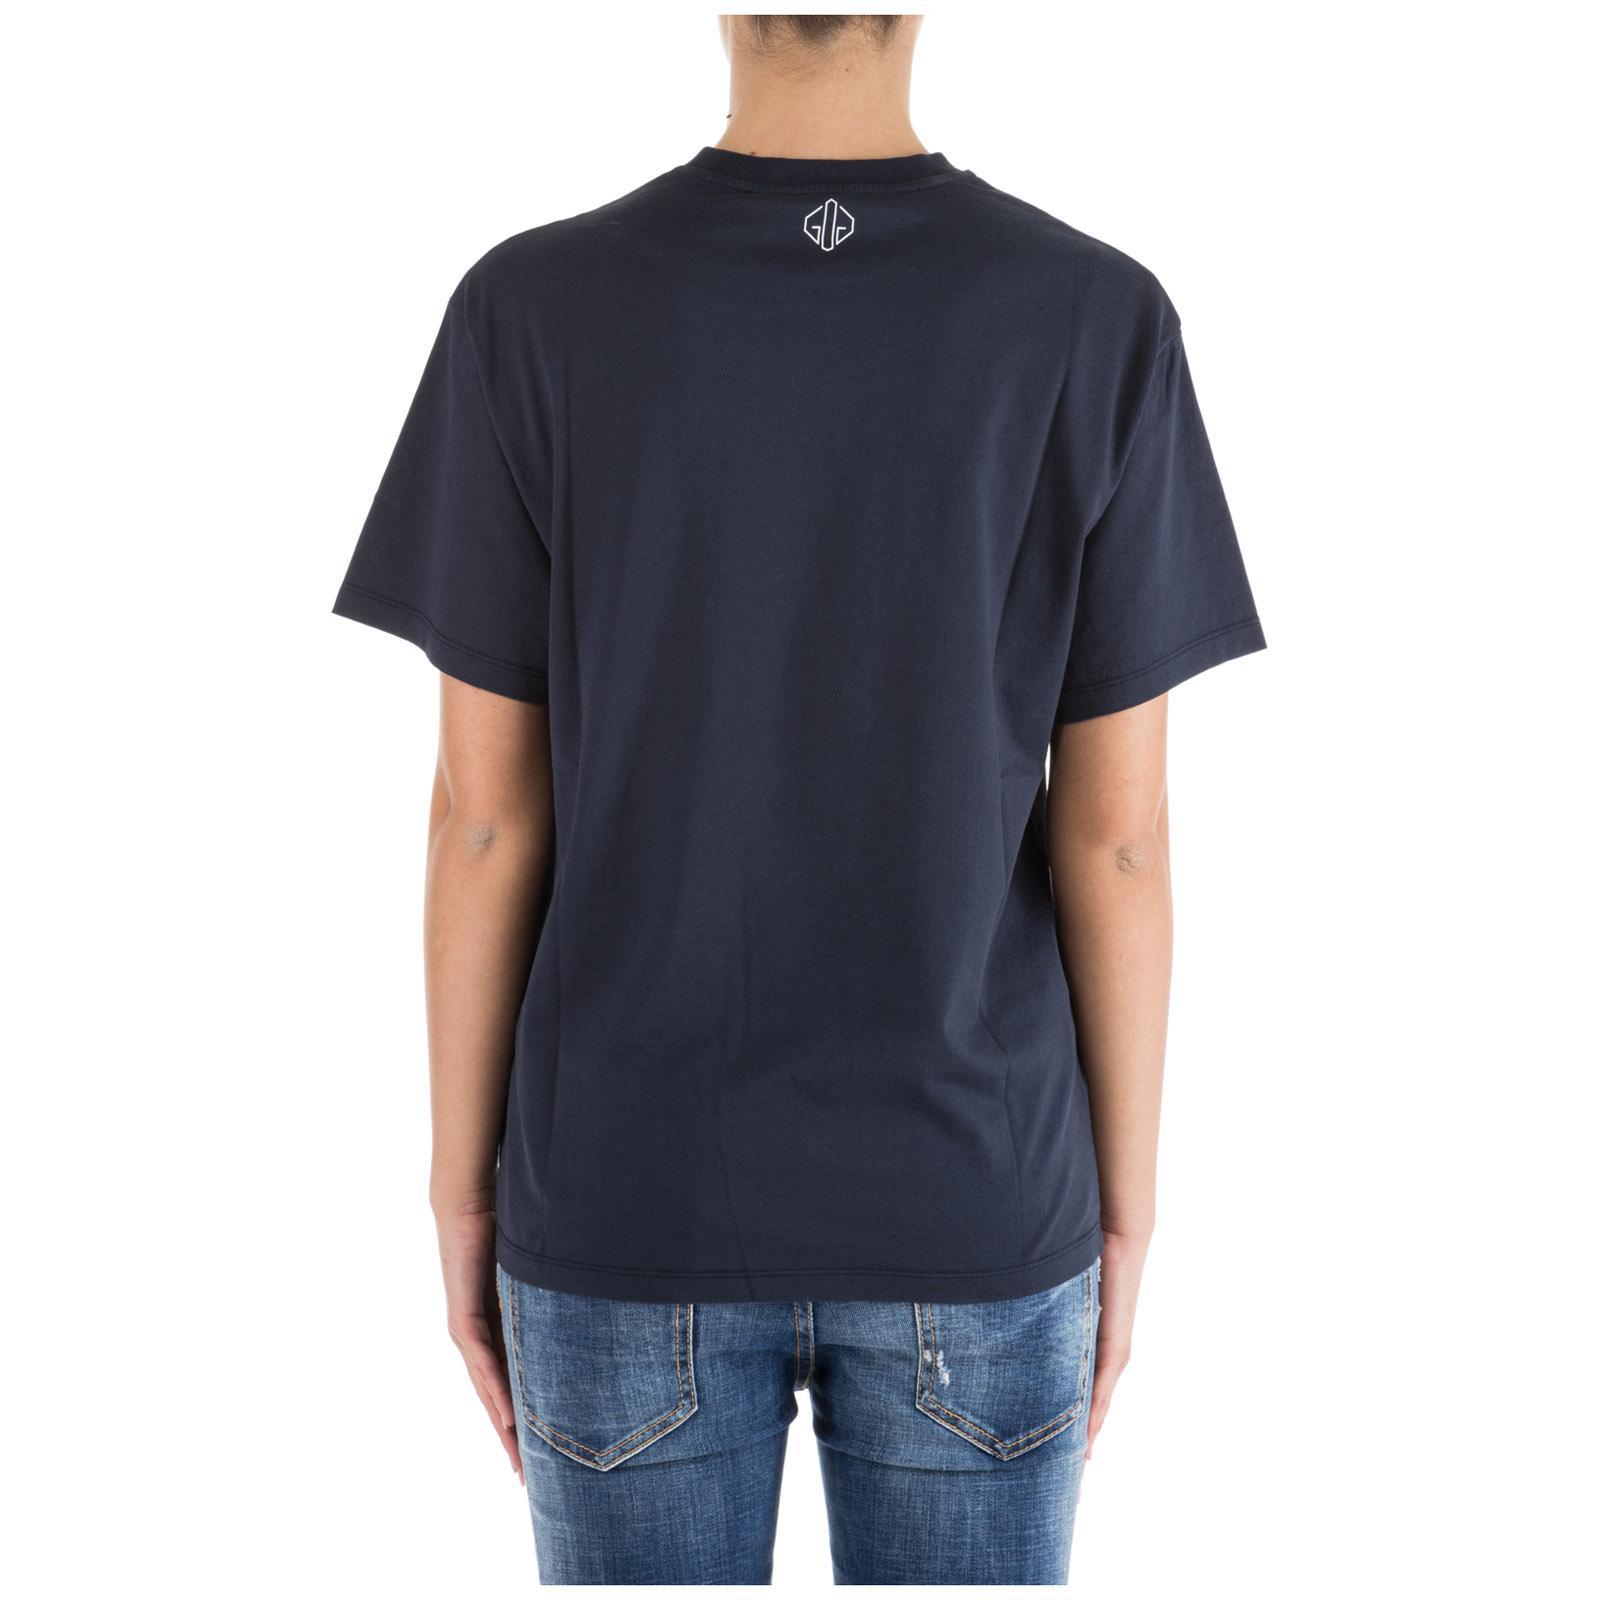 Women's t-shirt short sleeve crew neck round golden